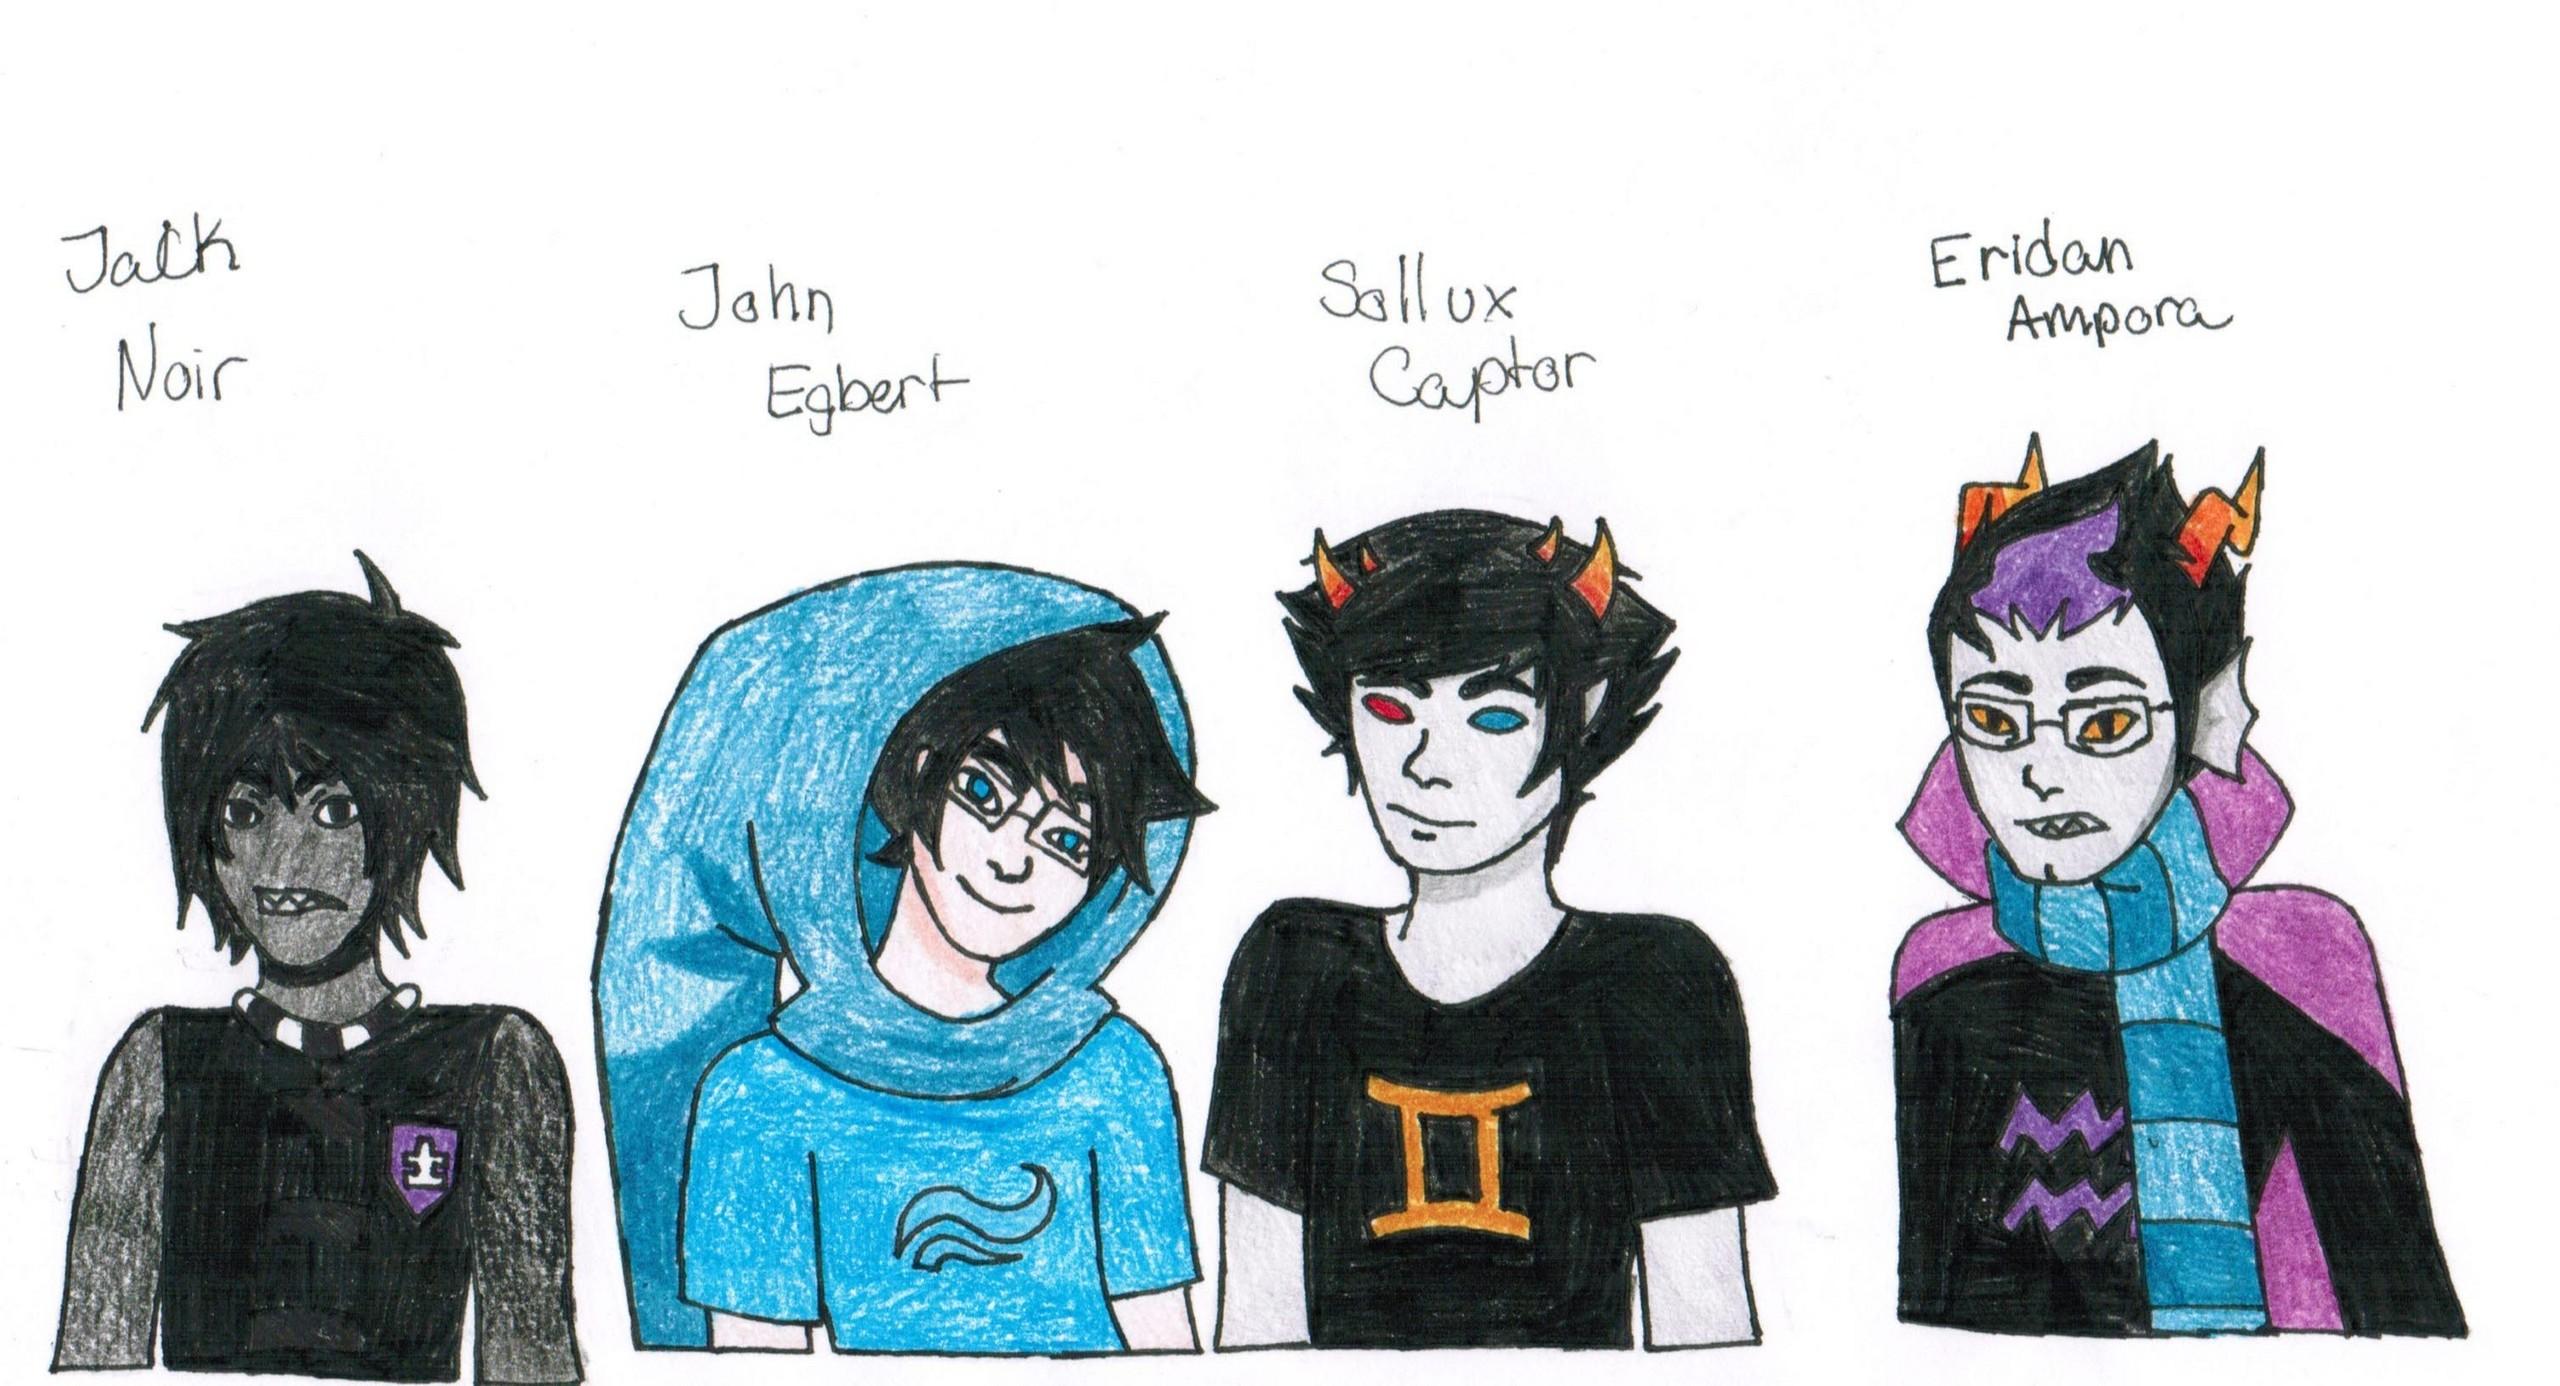 Jack Noir, John Egbert, Sollux Captor, And Eridan Ampora